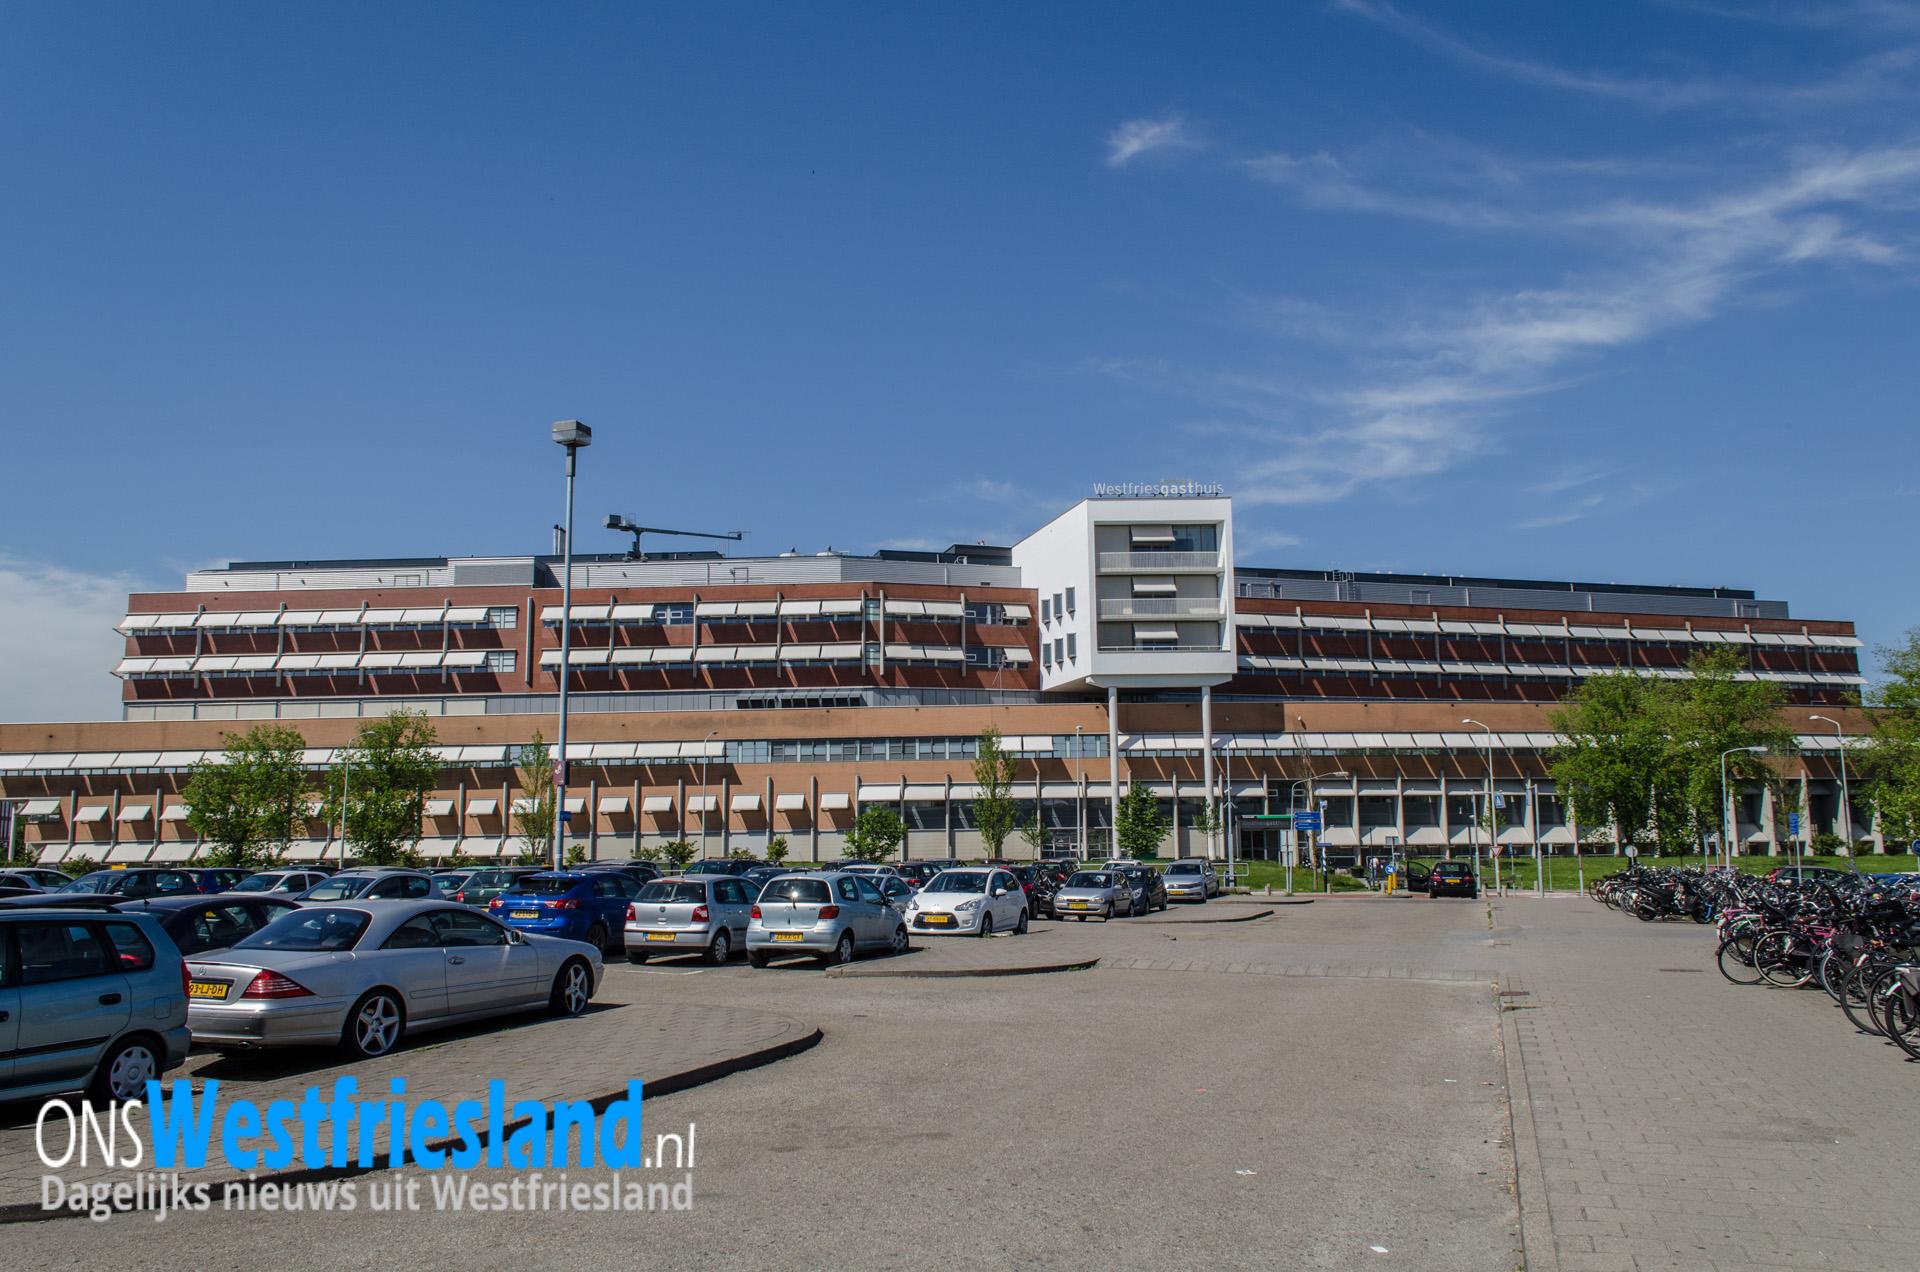 'Westfriesgasthuis drie keer slachtoffer randsomware-virus'